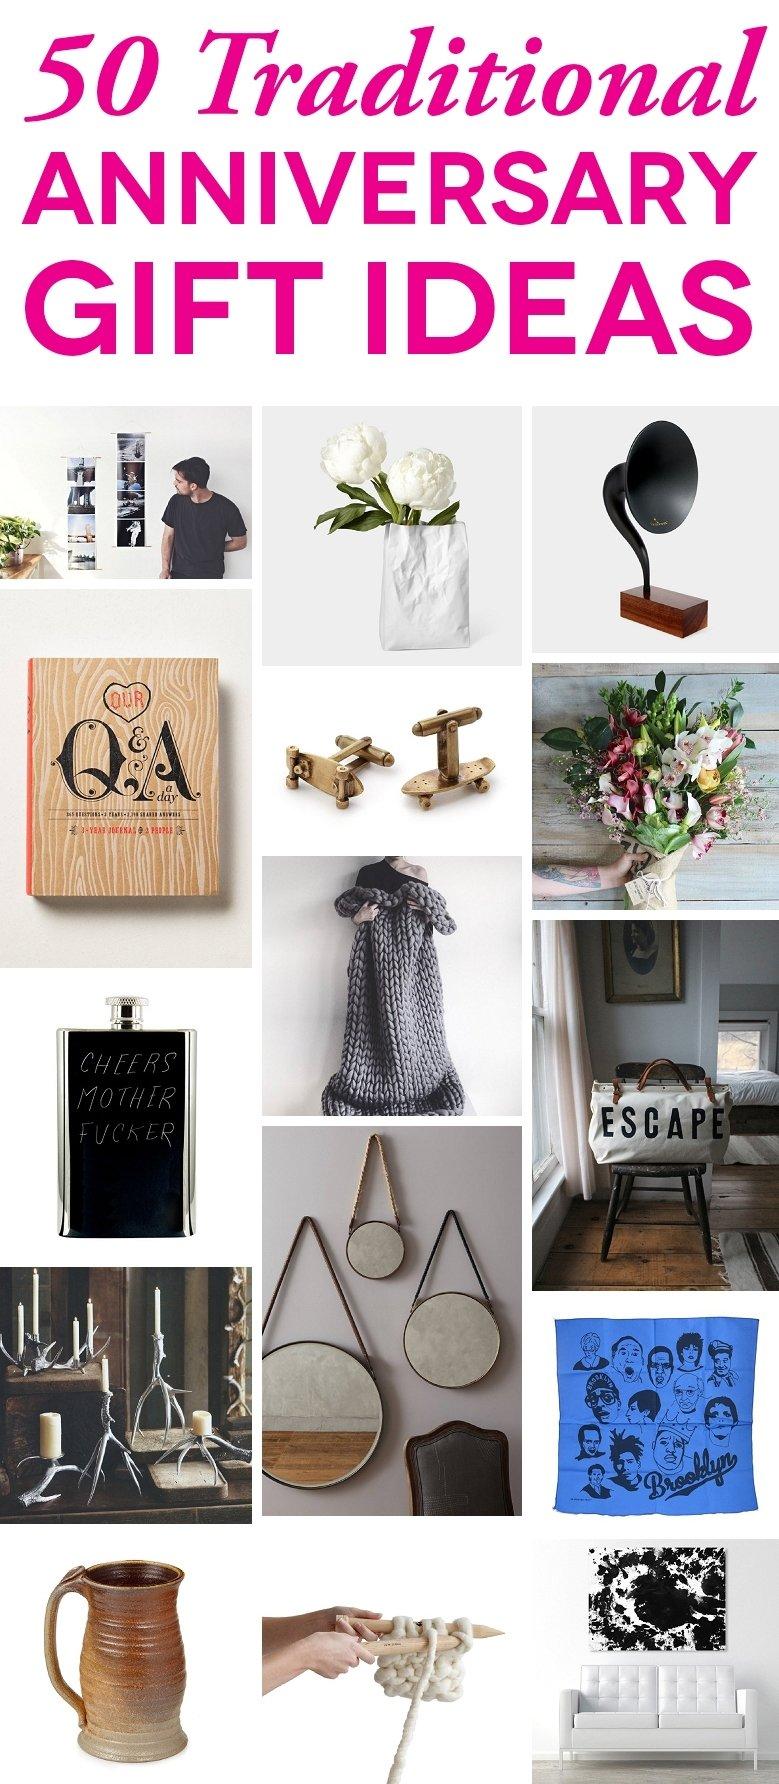 10 Stylish 3rd Wedding Anniversary Gift Ideas For Him